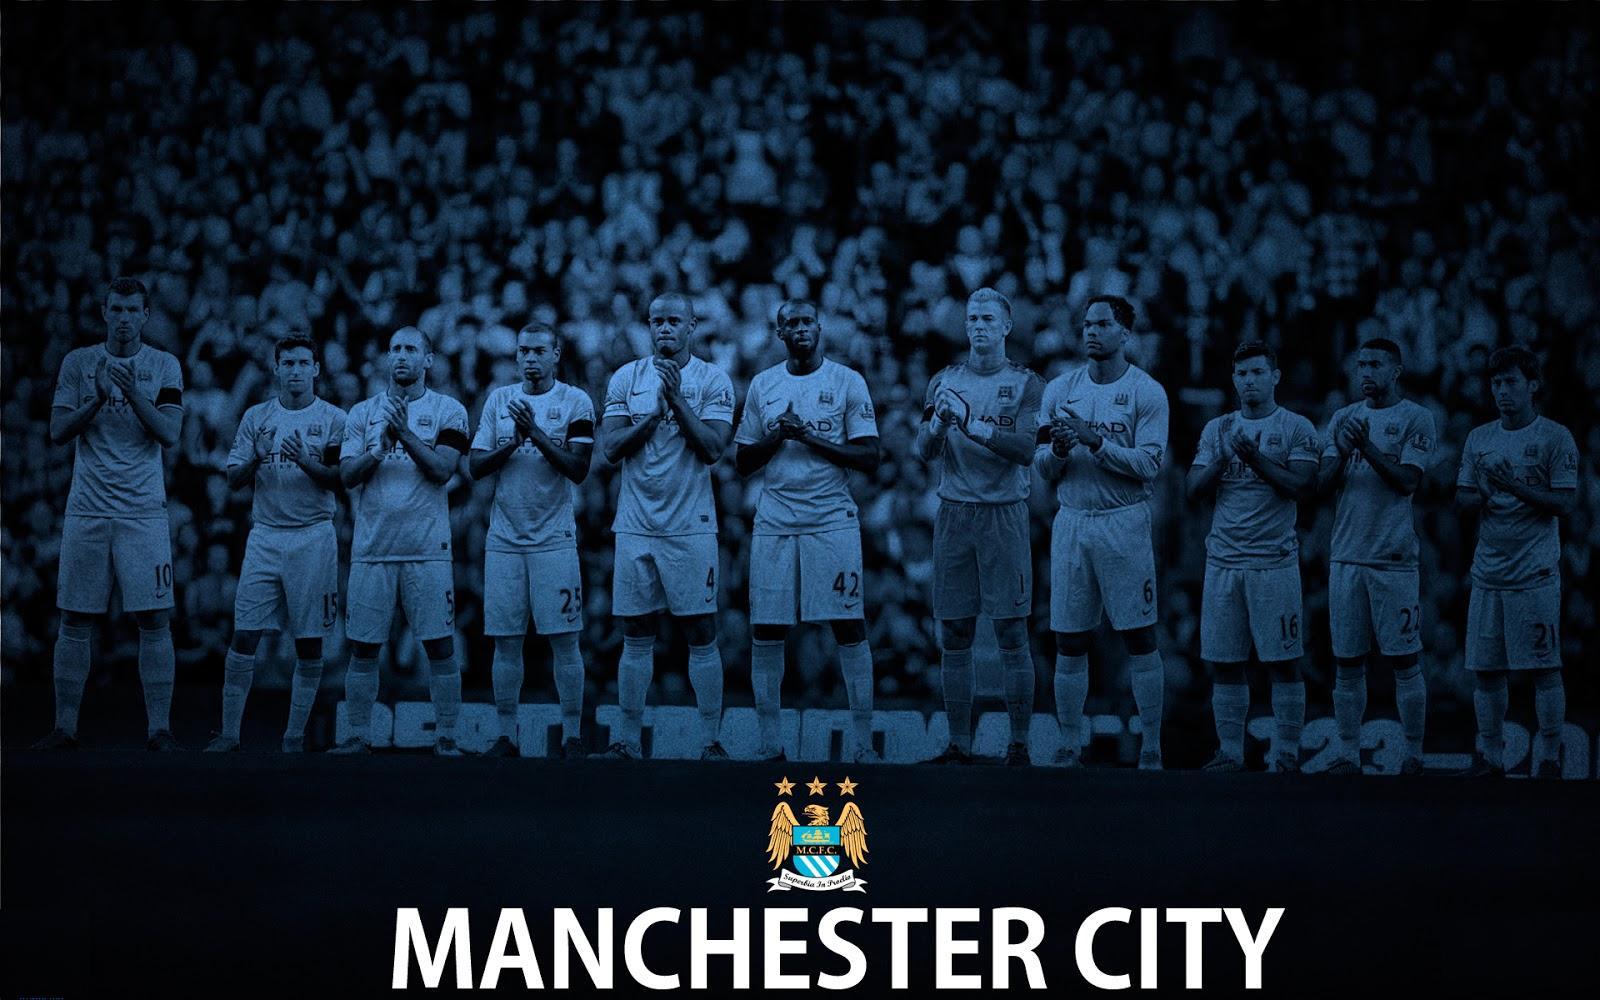 49 ] Manchester City Wallpaper 2016 On WallpaperSafari